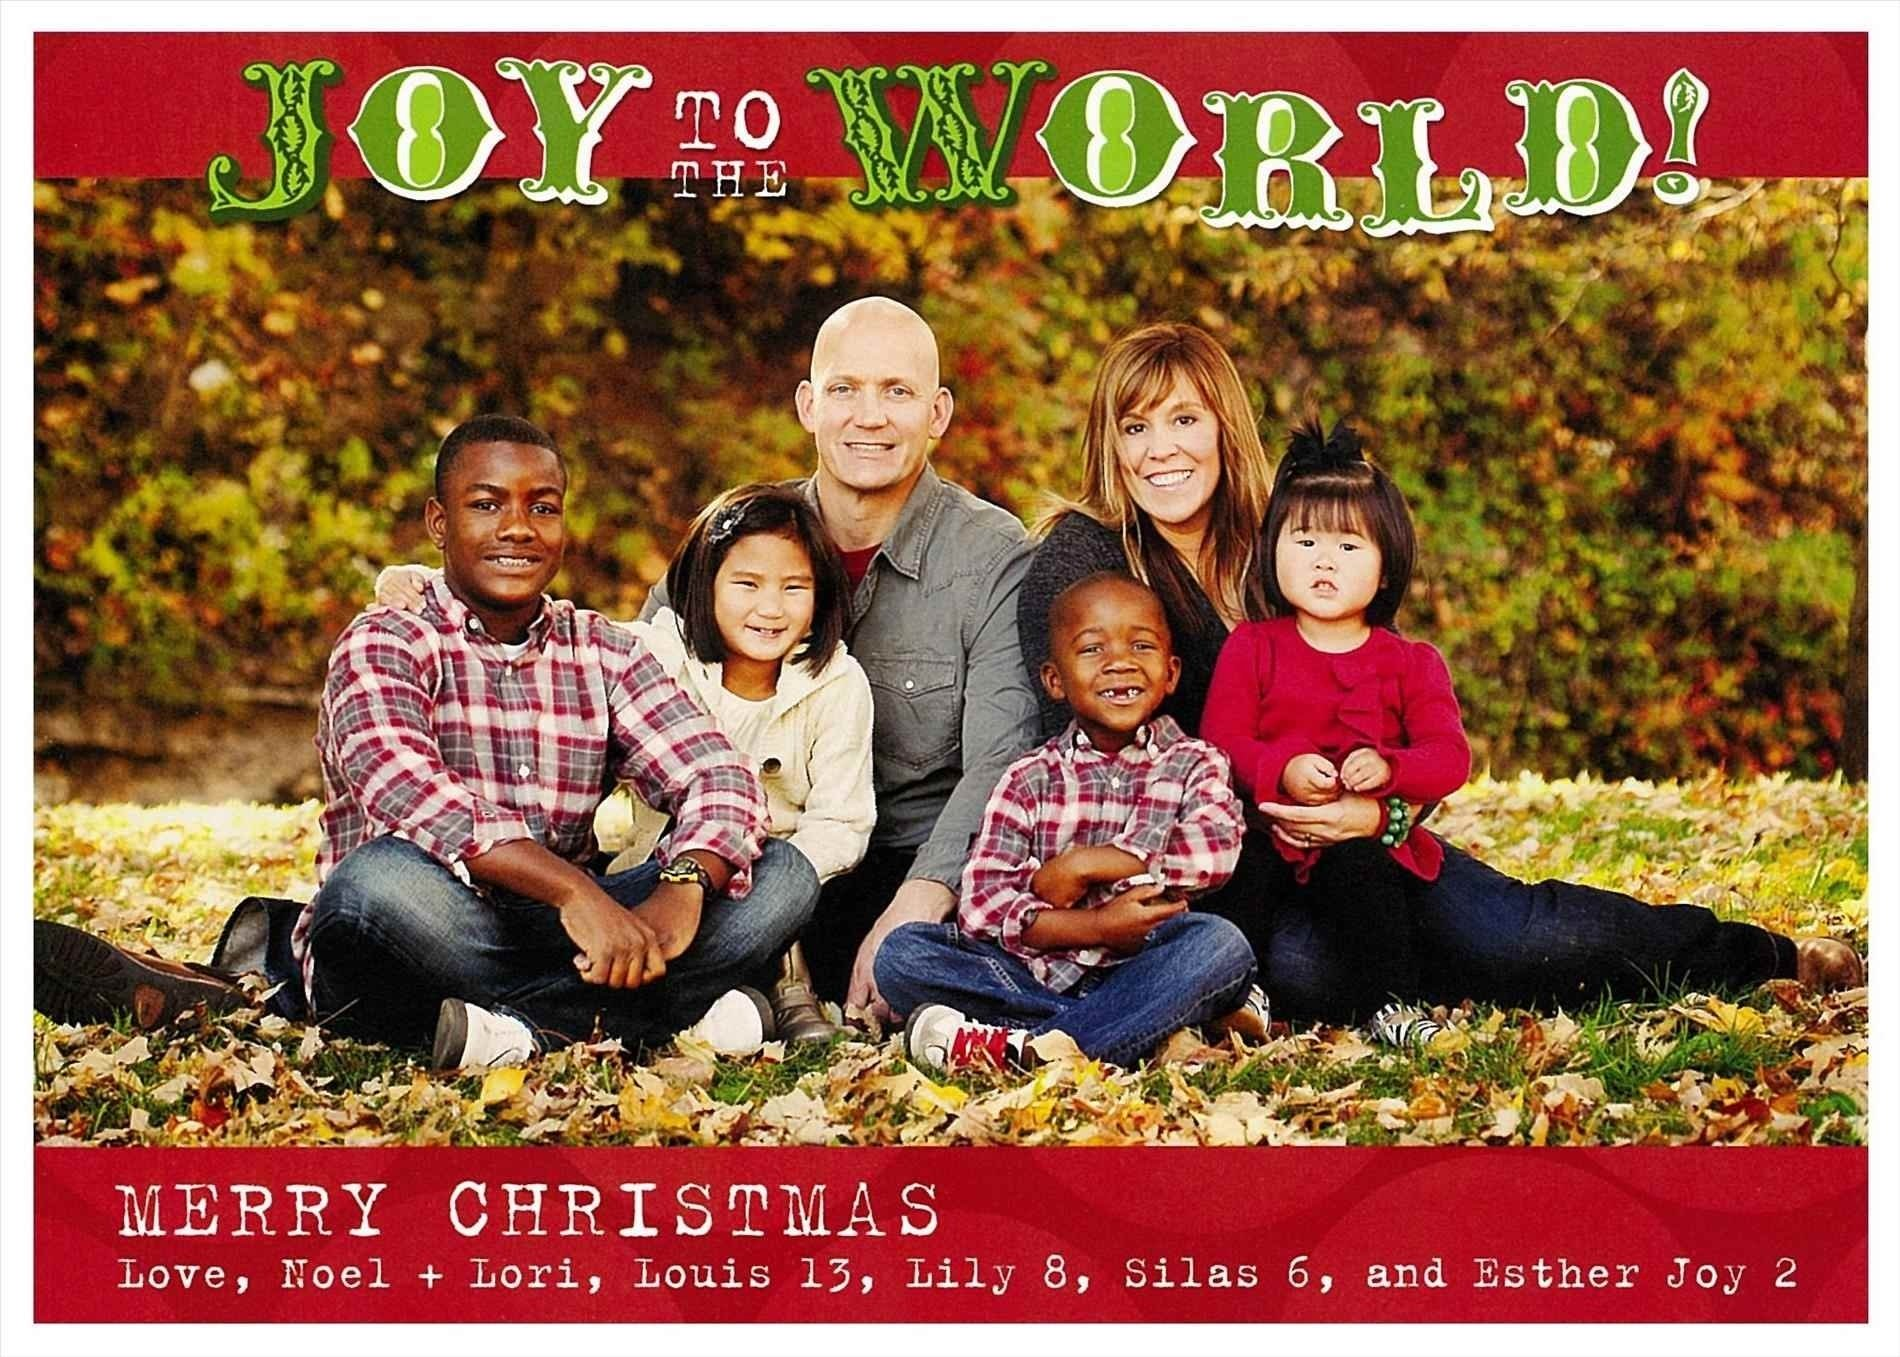 10 great funny family christmas card ideas funny family photo christmas card ideas merry christmas happy